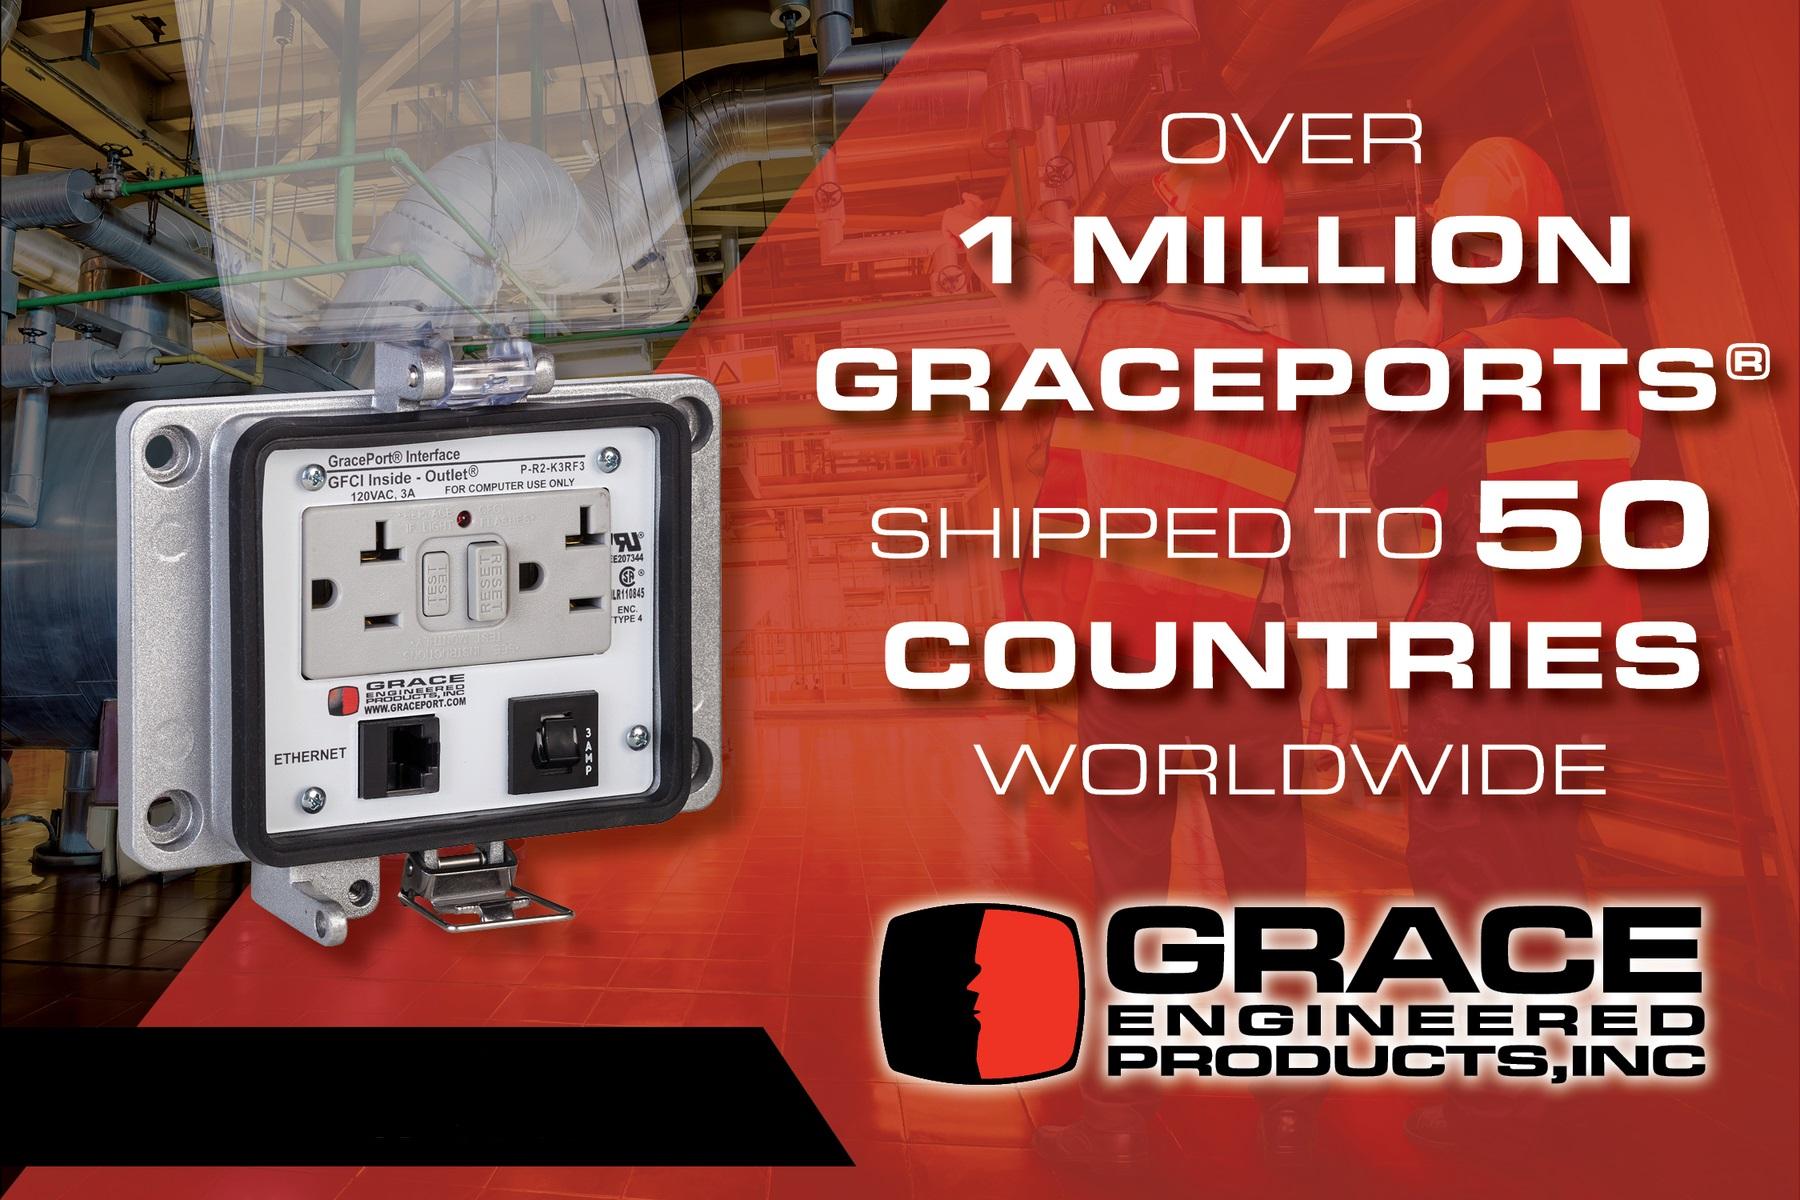 preview-lightbox-GracePort Stat Social Ad-1